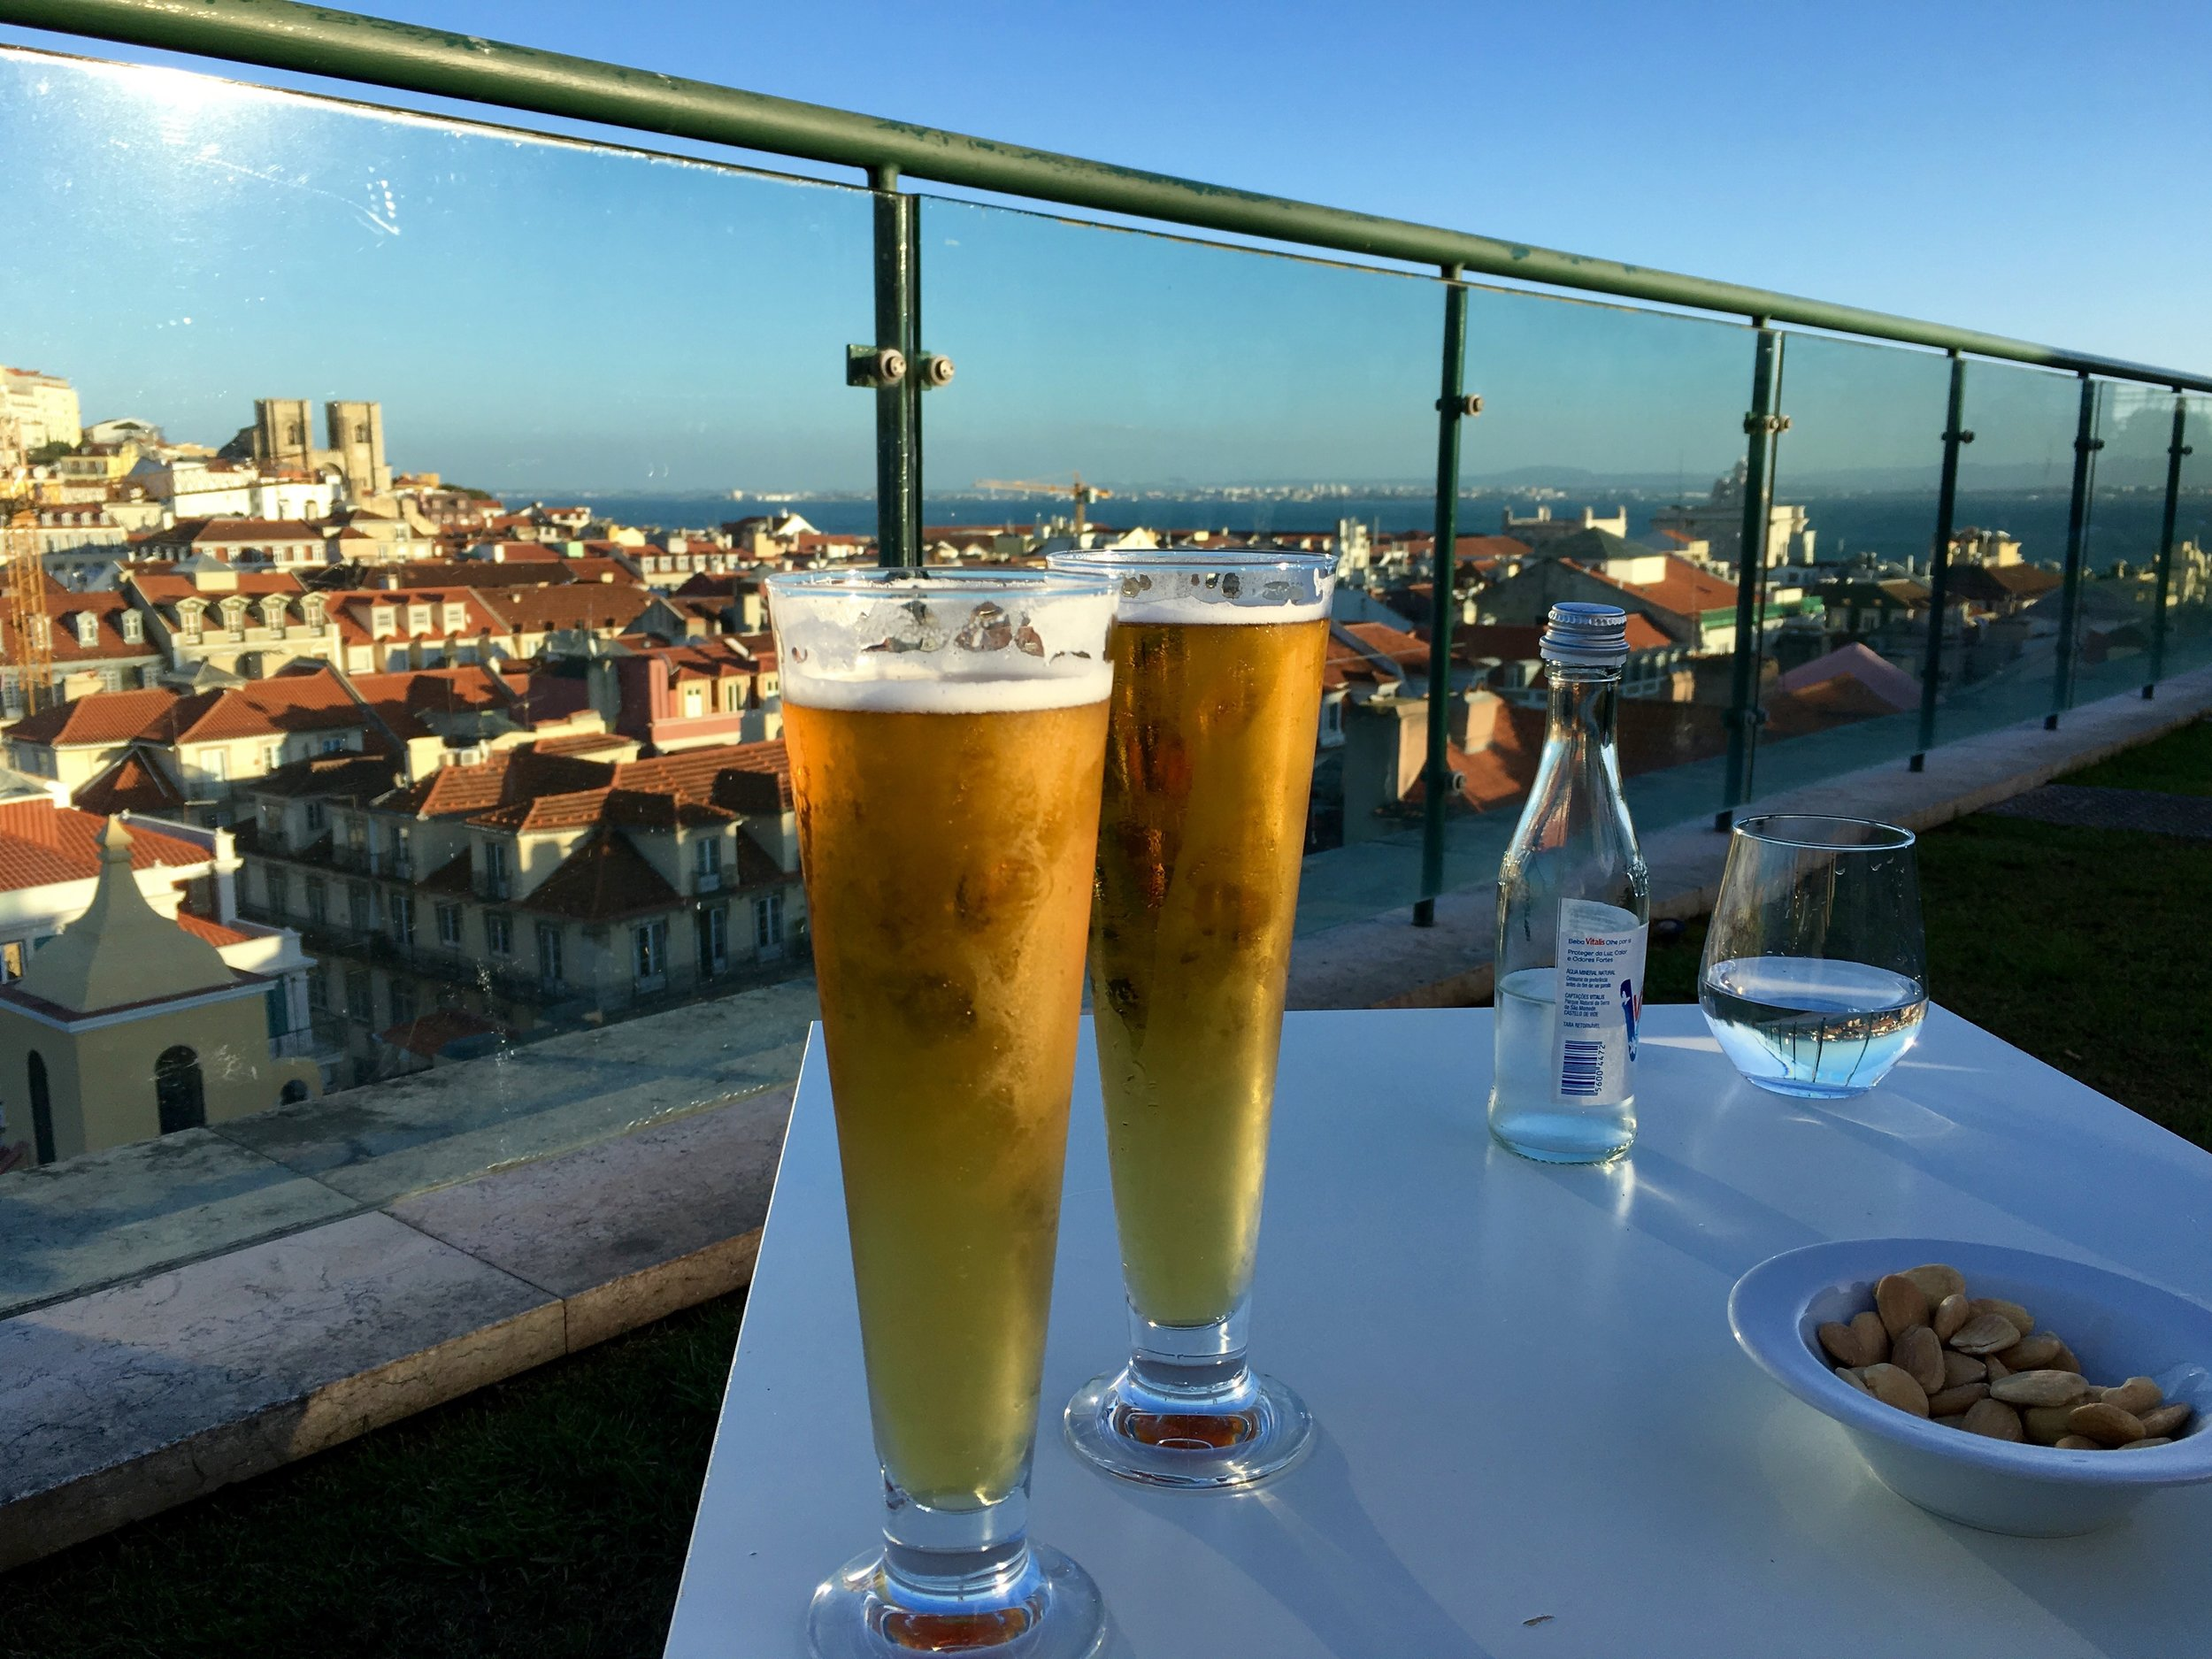 Bar Entretanto, Hotel do Chiado, Lisbon